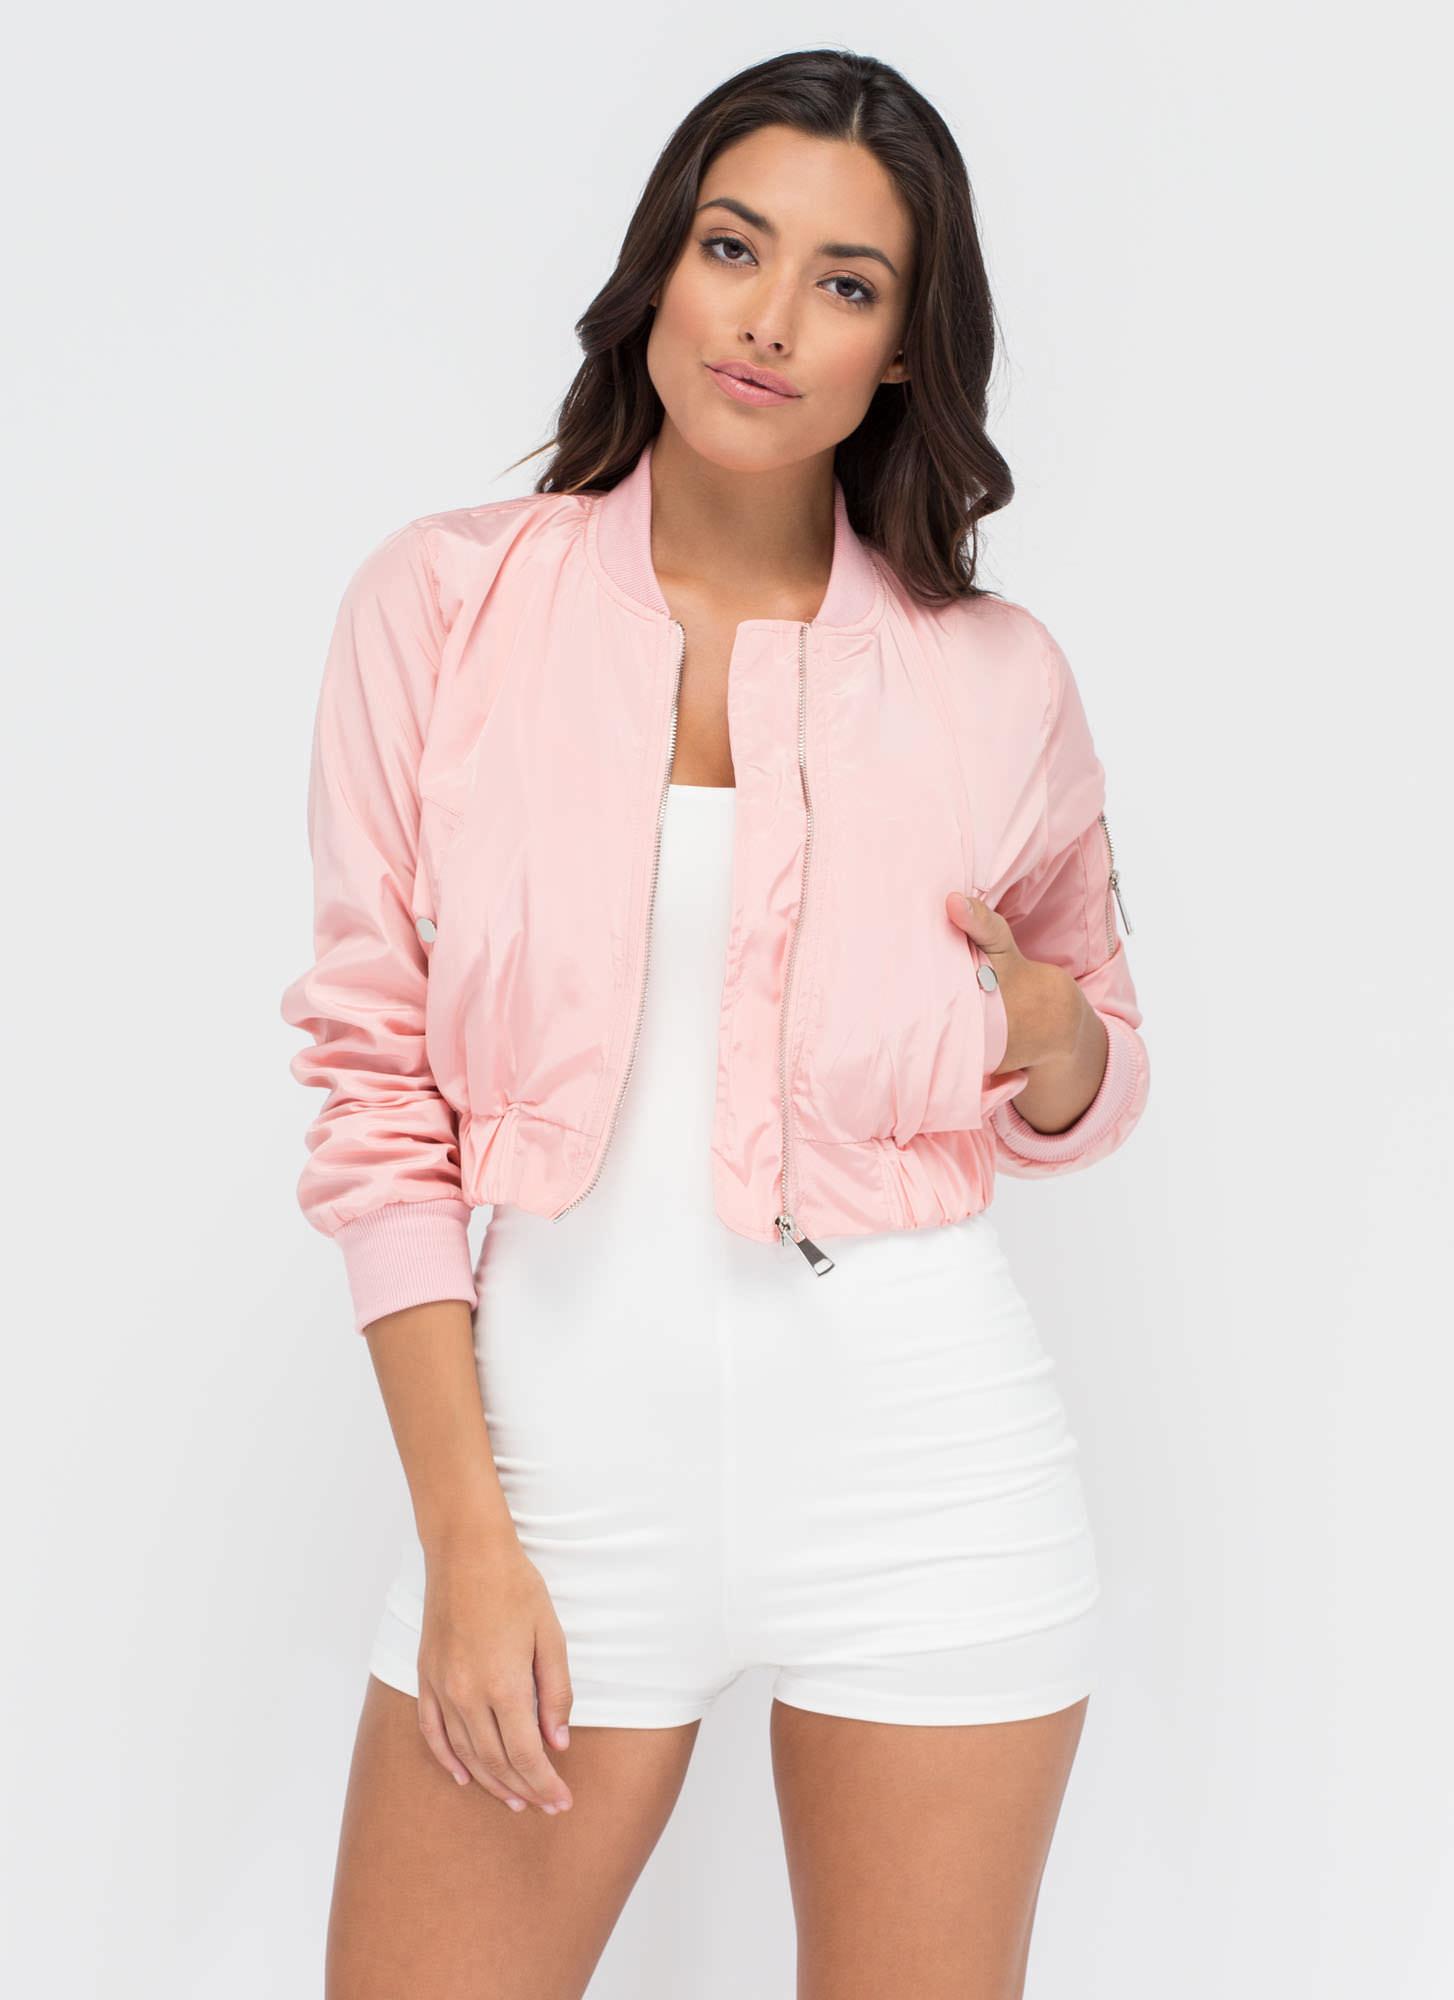 Cropped Pink Jacket - My Jacket